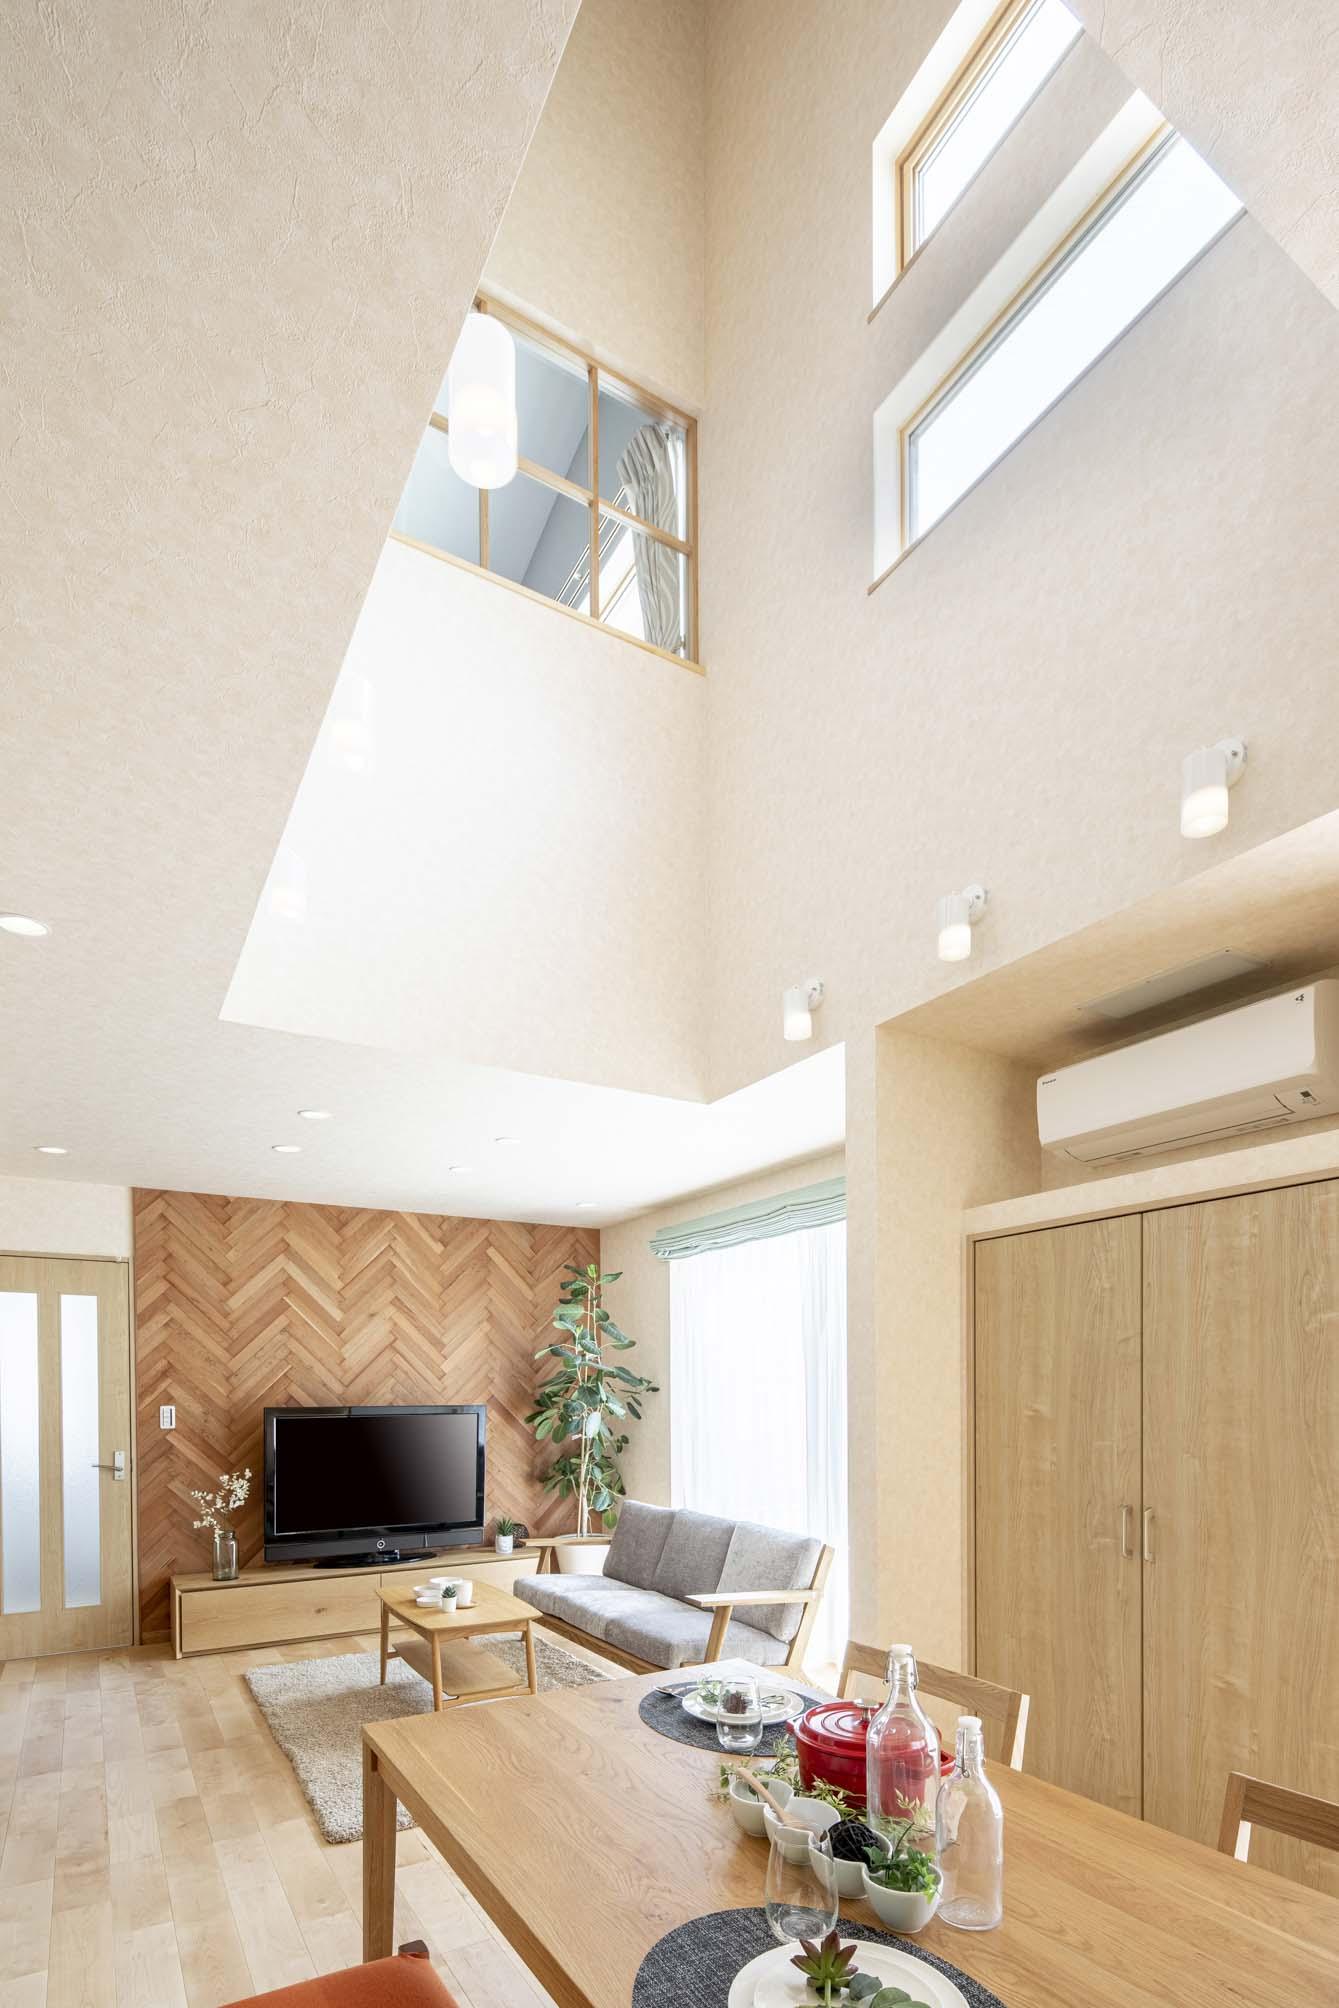 愛知県マンション撮影 広告写真 建築写真 名古屋建築写真 名古屋マンション撮影 iedori